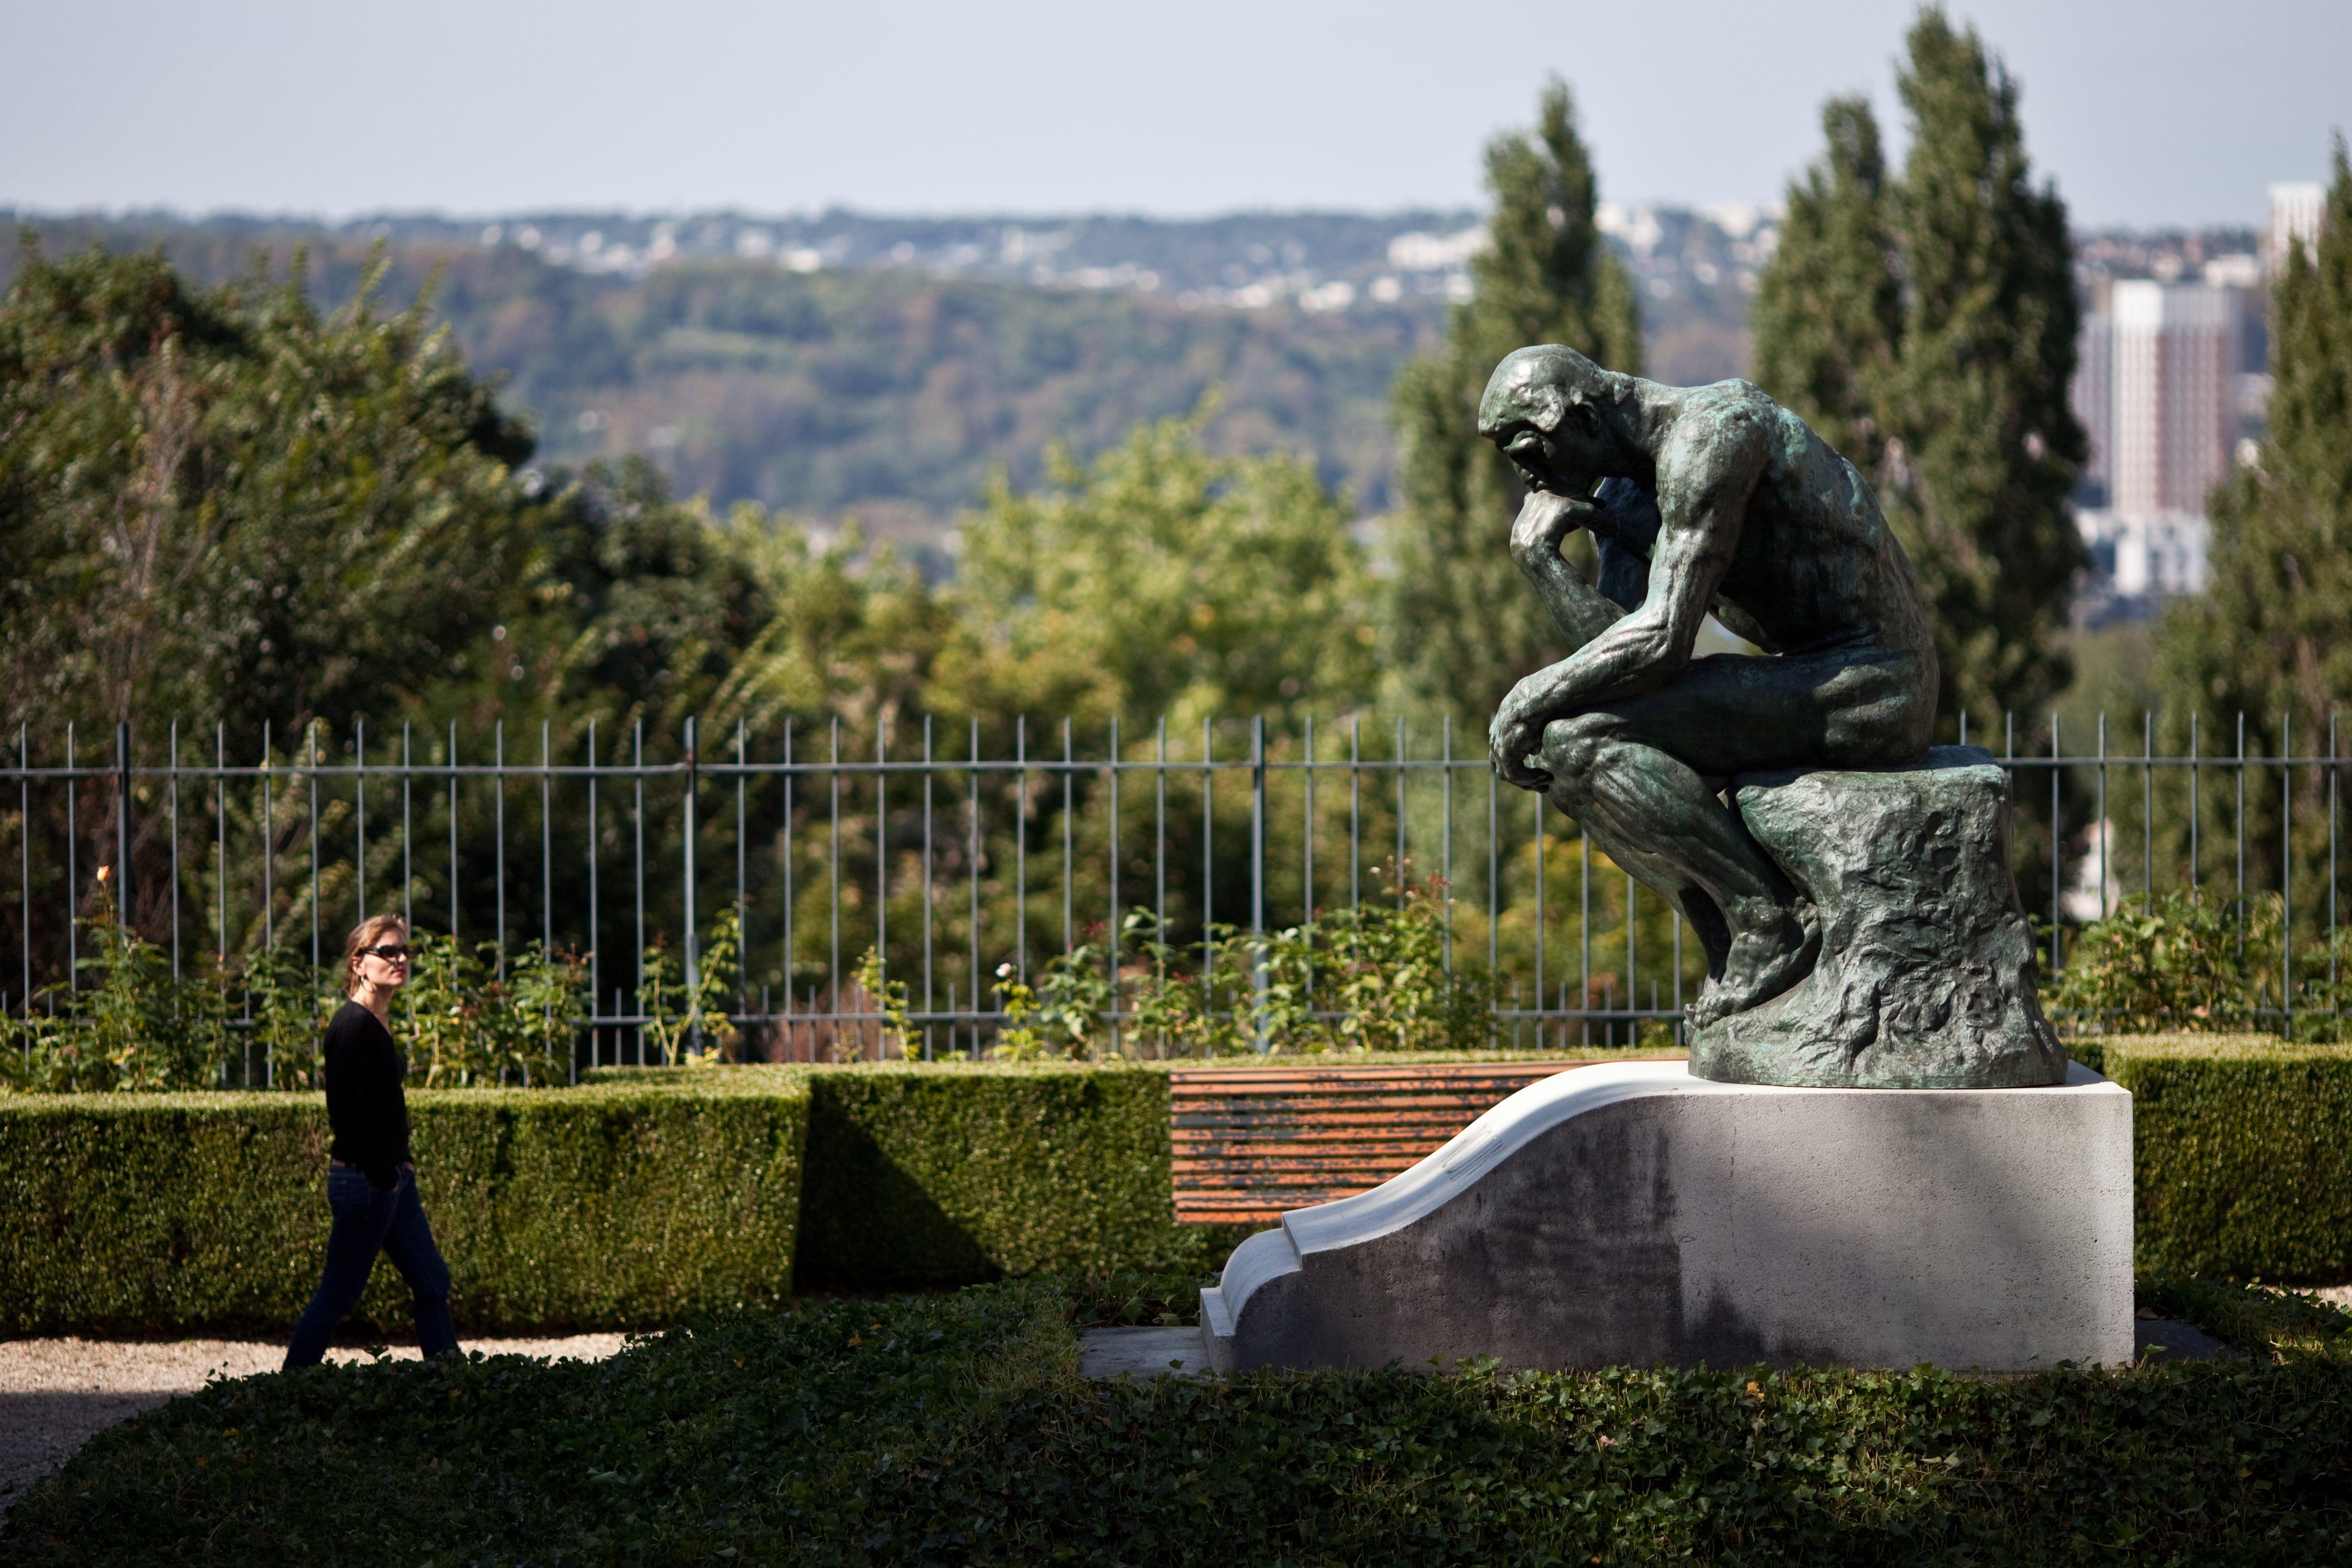 Musée Rodin Meudon. Le Penseur sur la tombe de Rodin. Musée Rodin%252FJ. de Calan